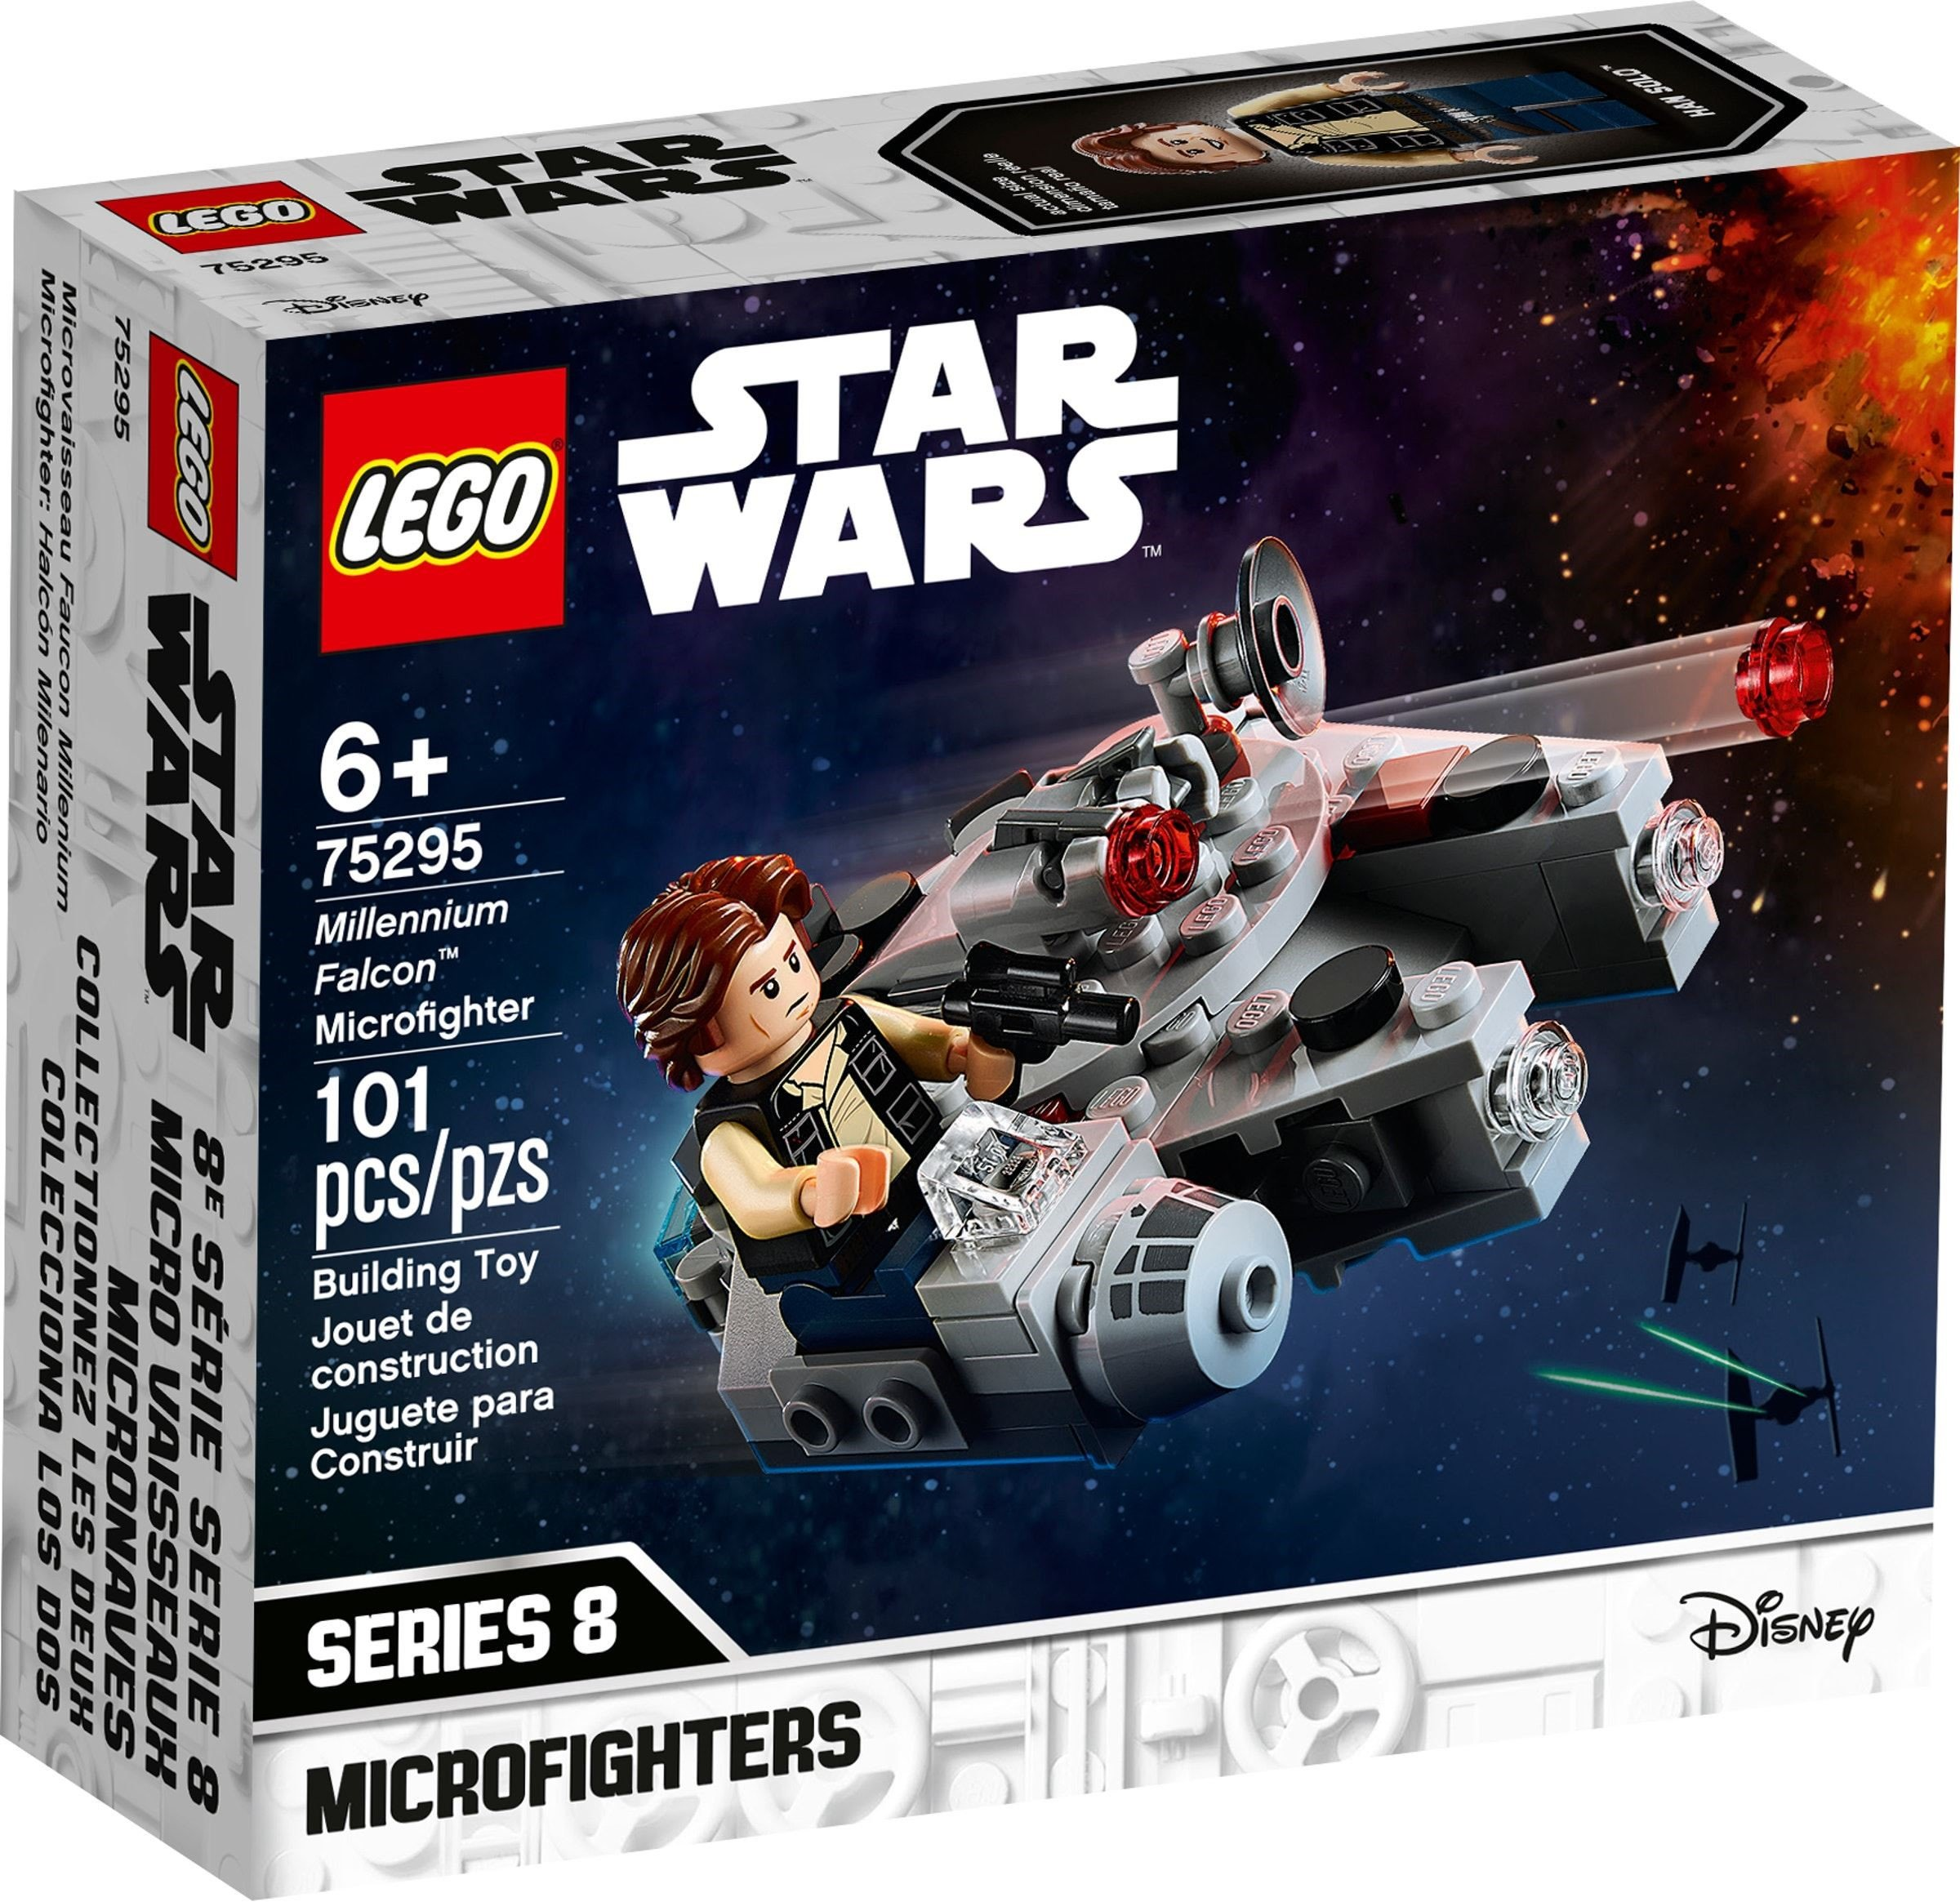 LEGO Star Wars - Millennium Falcon™ Microfighter (75295)